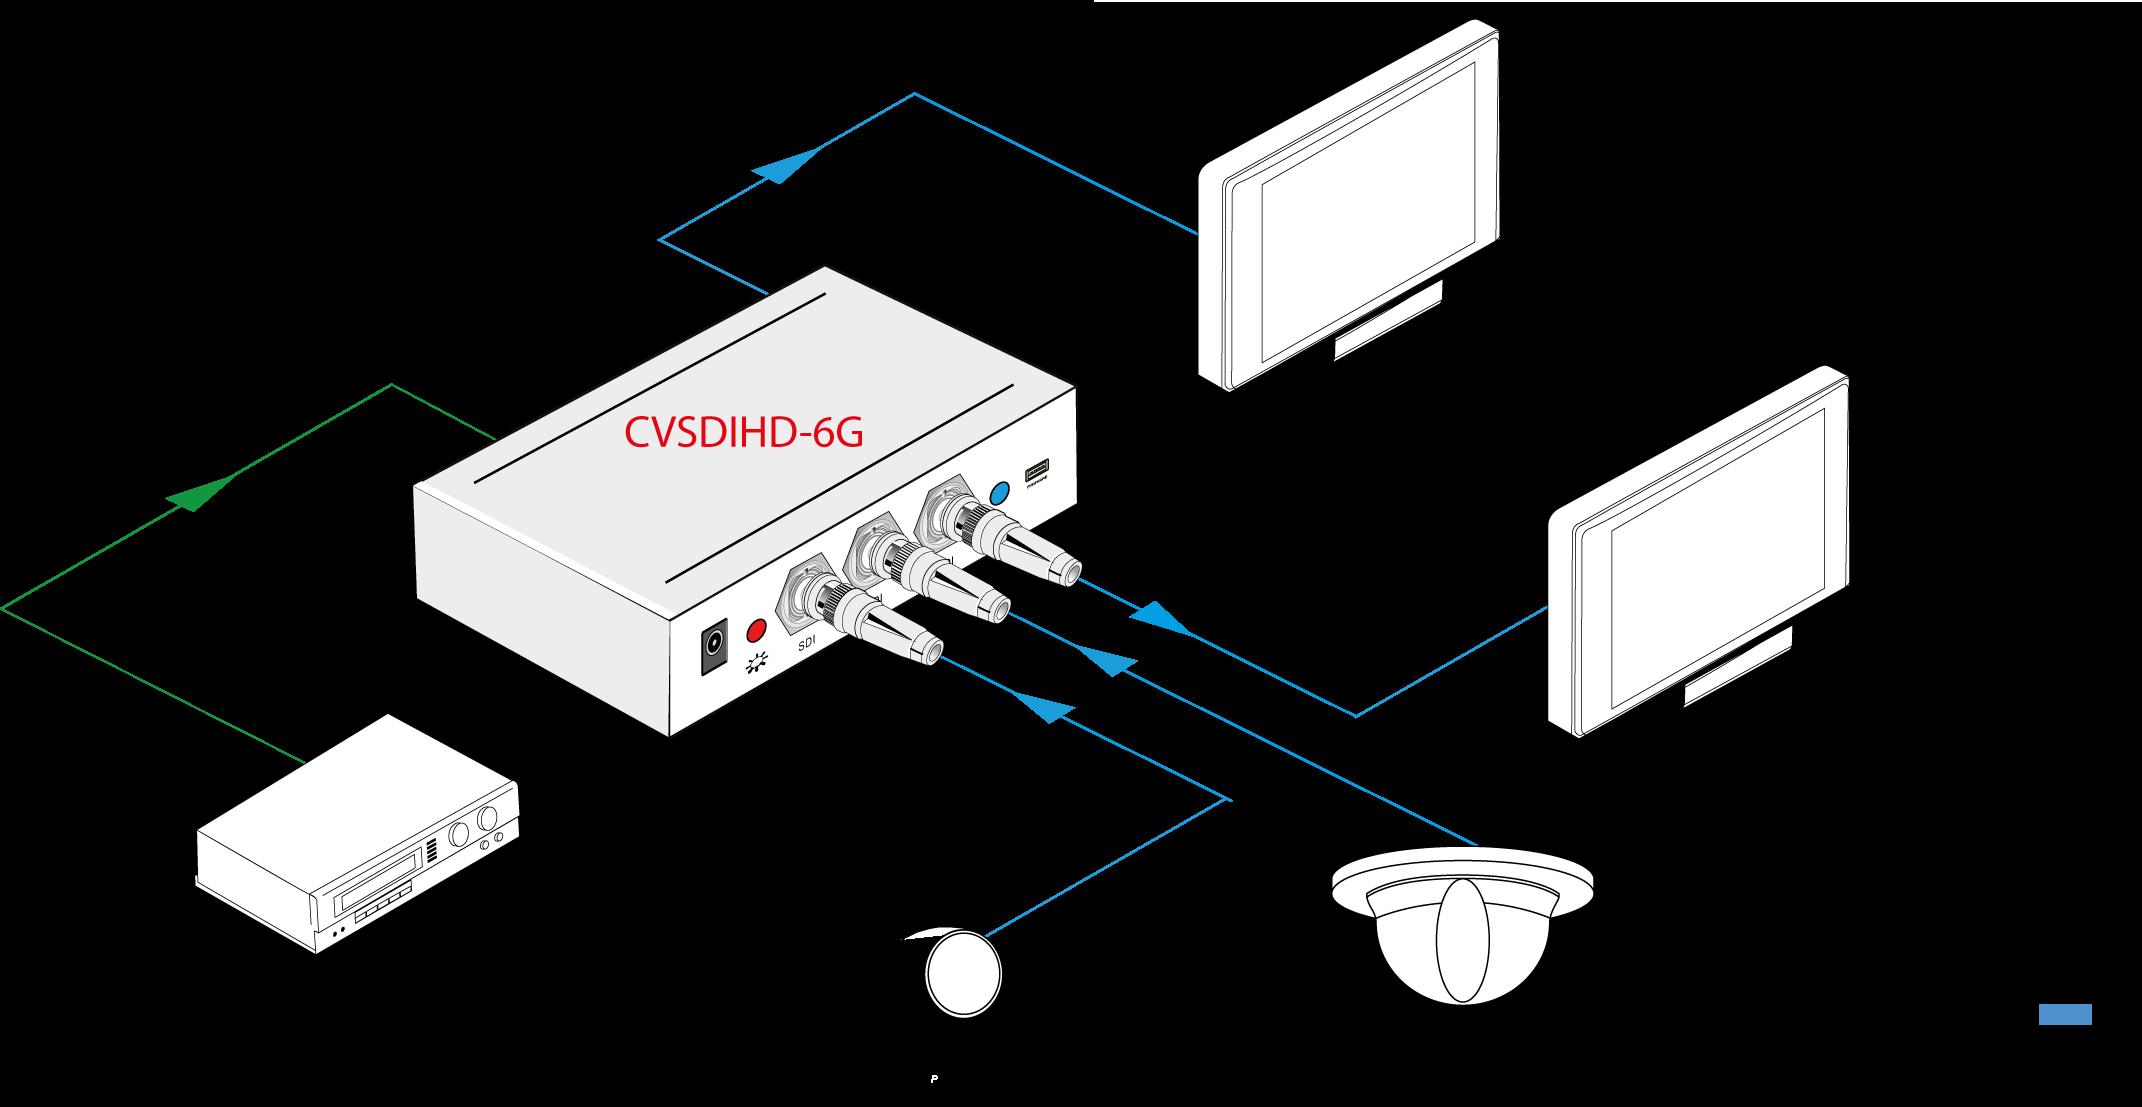 CVSDIHD-6G